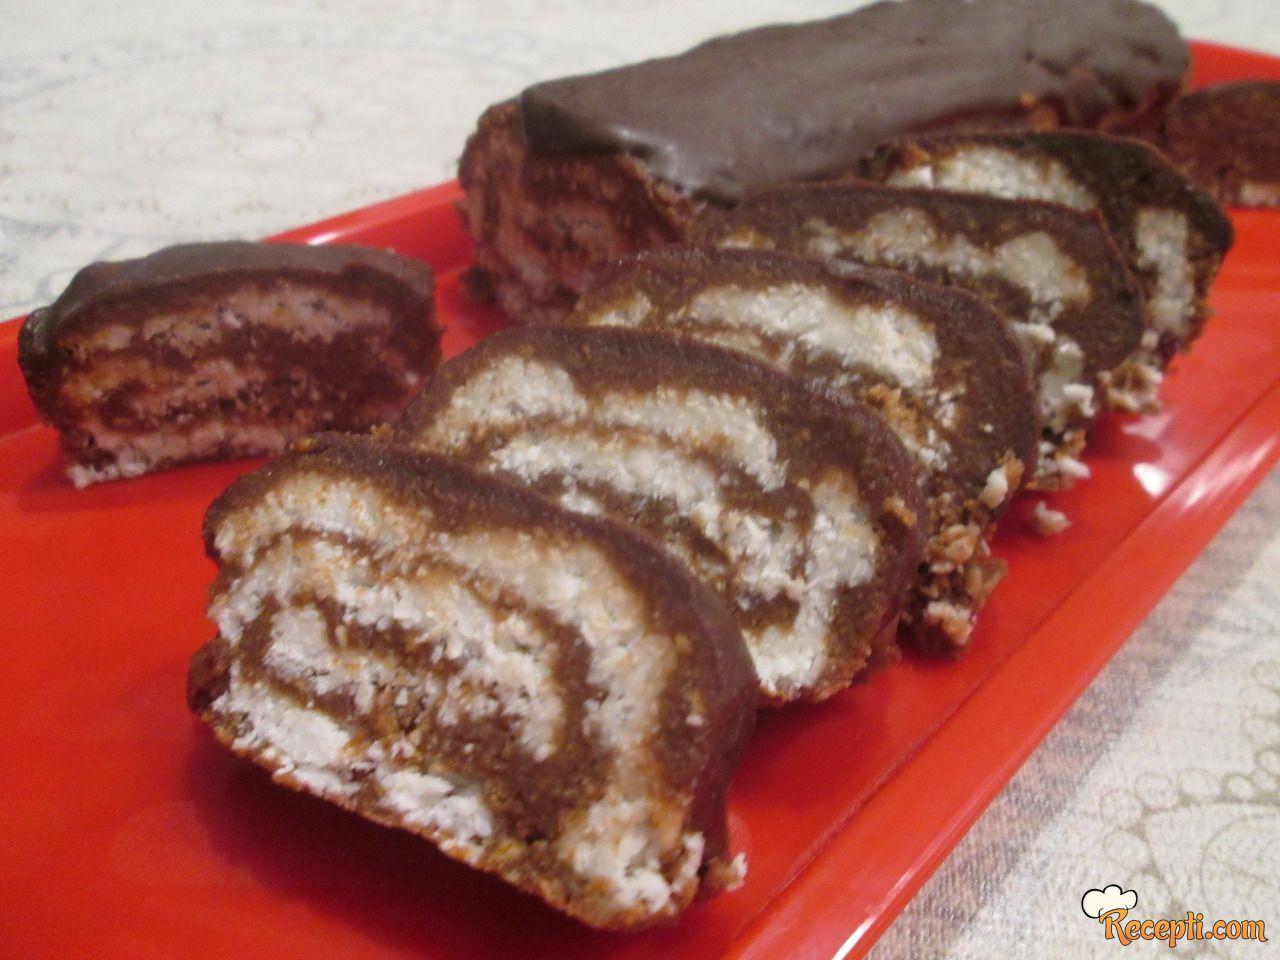 Čokoladni rolat sa kokosom